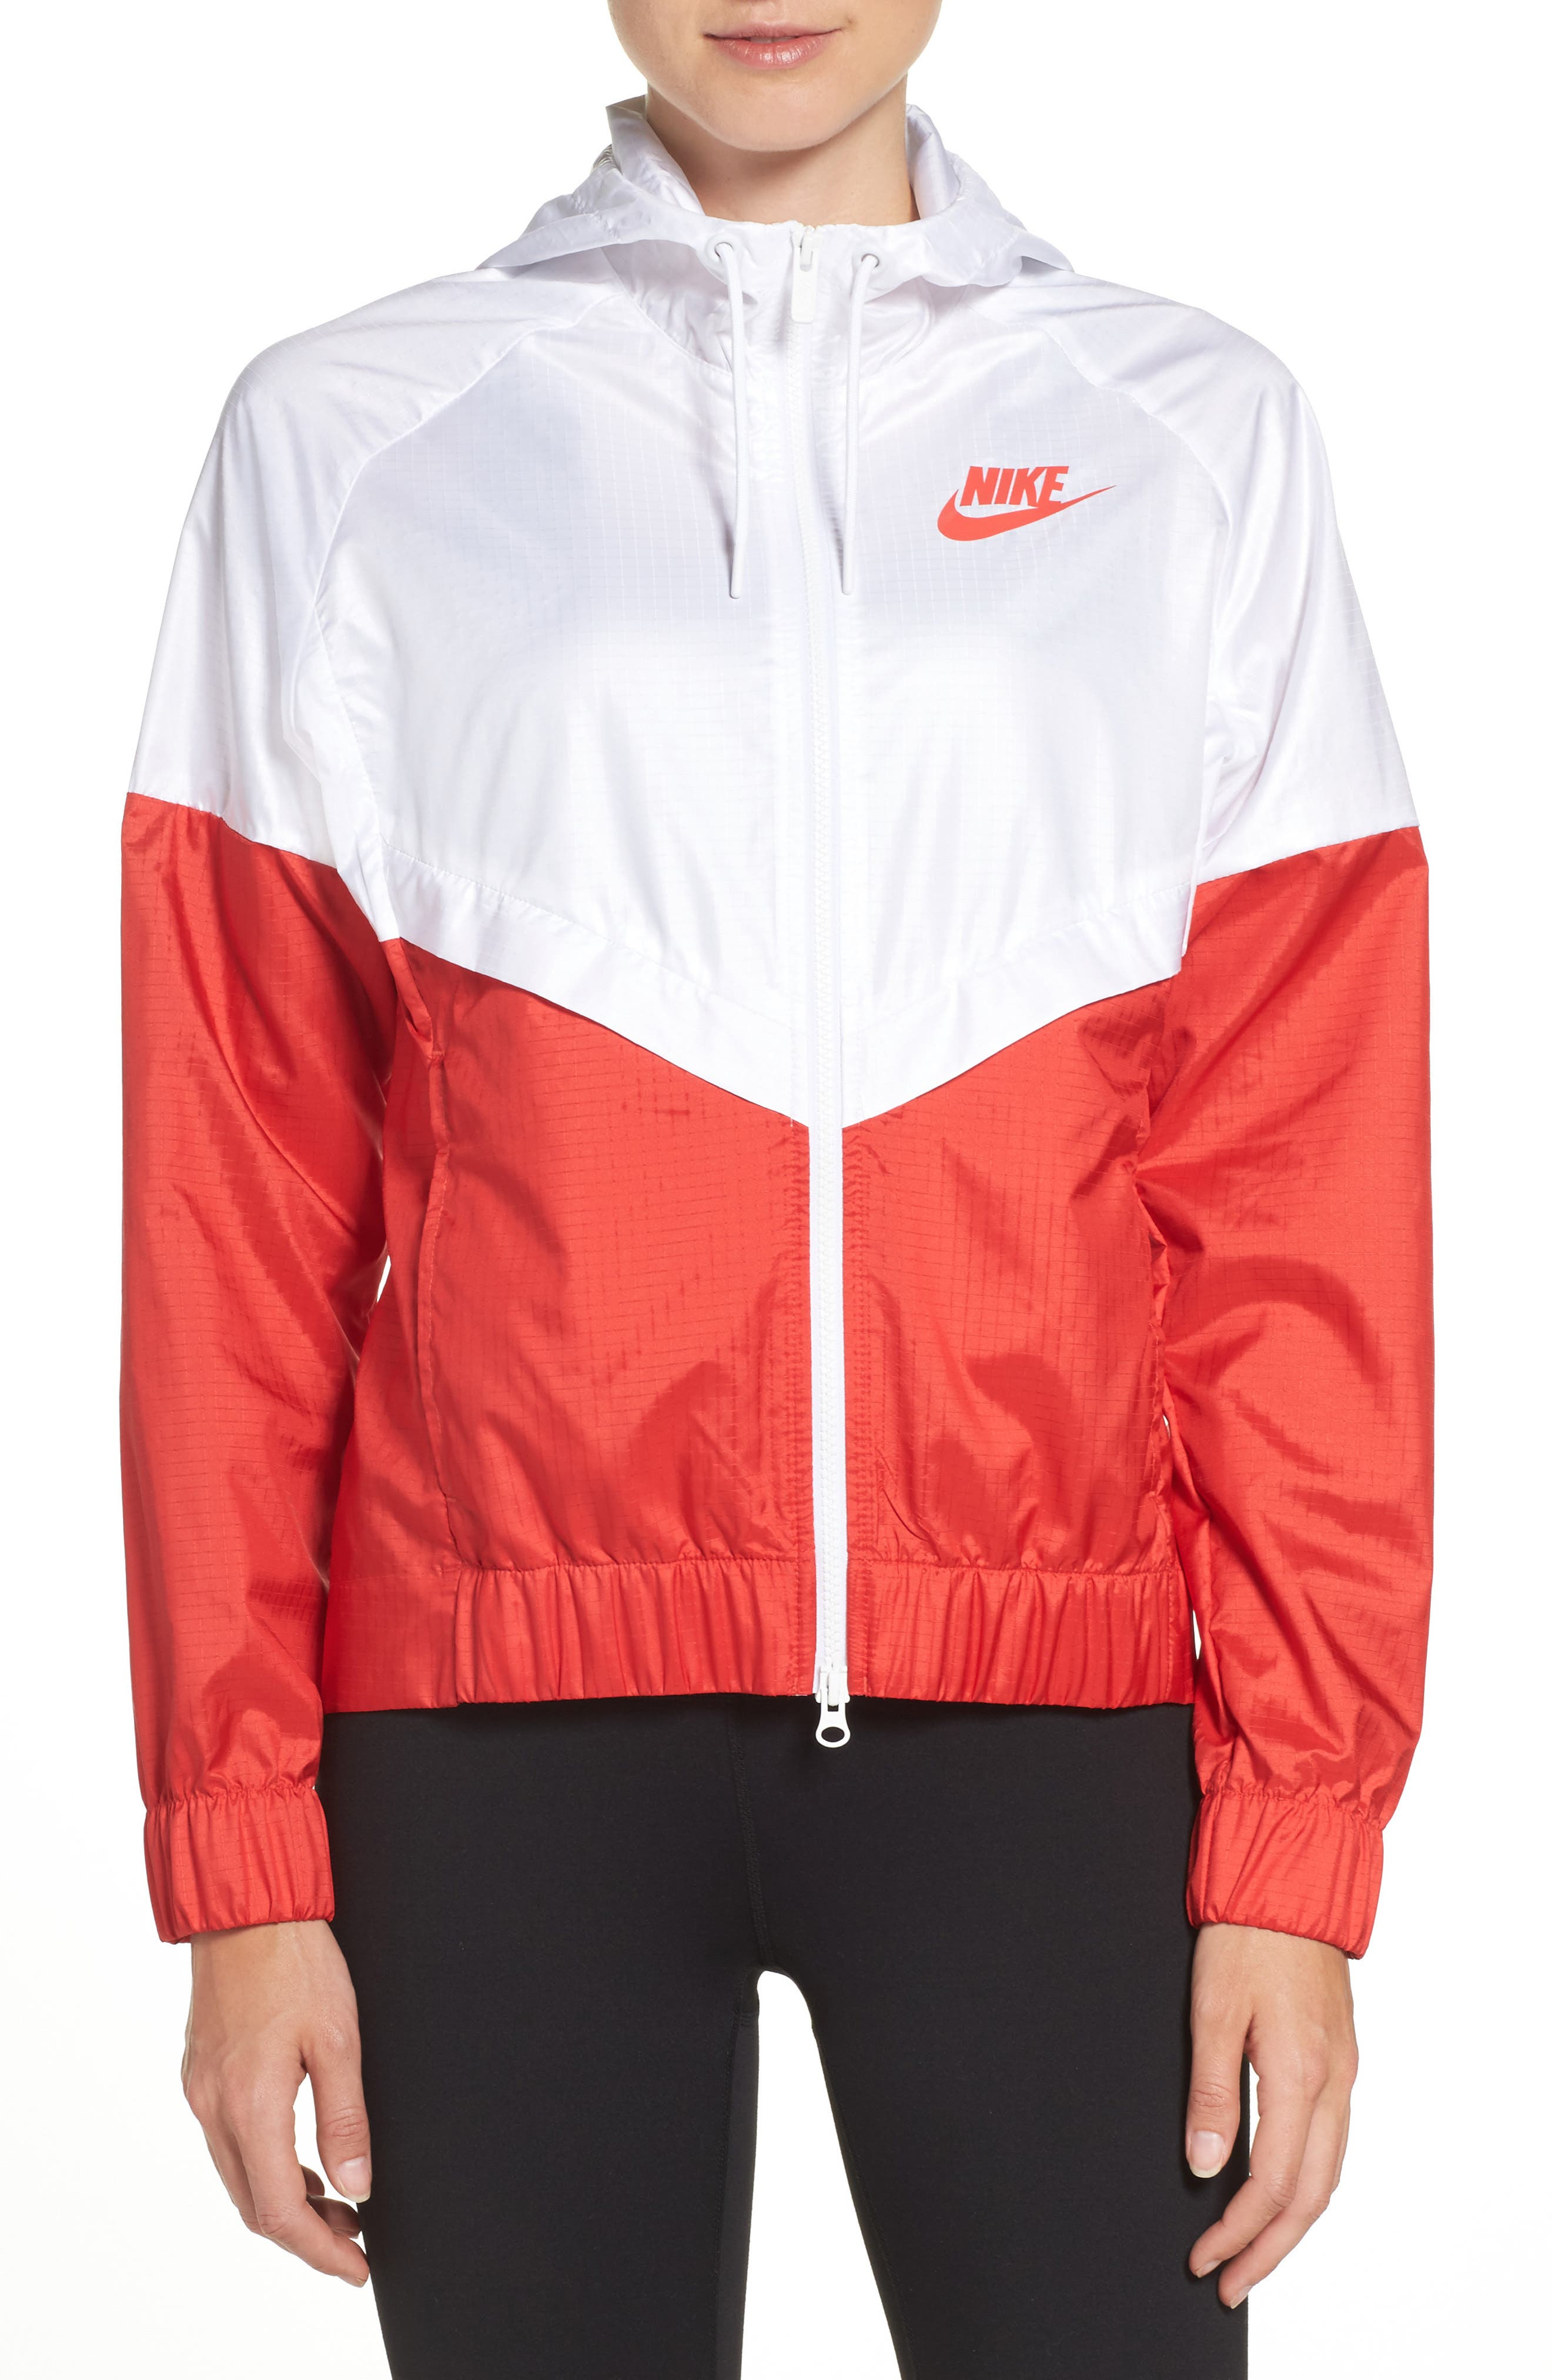 Nike 'Windrunner' Hooded Windbreaker Jacket